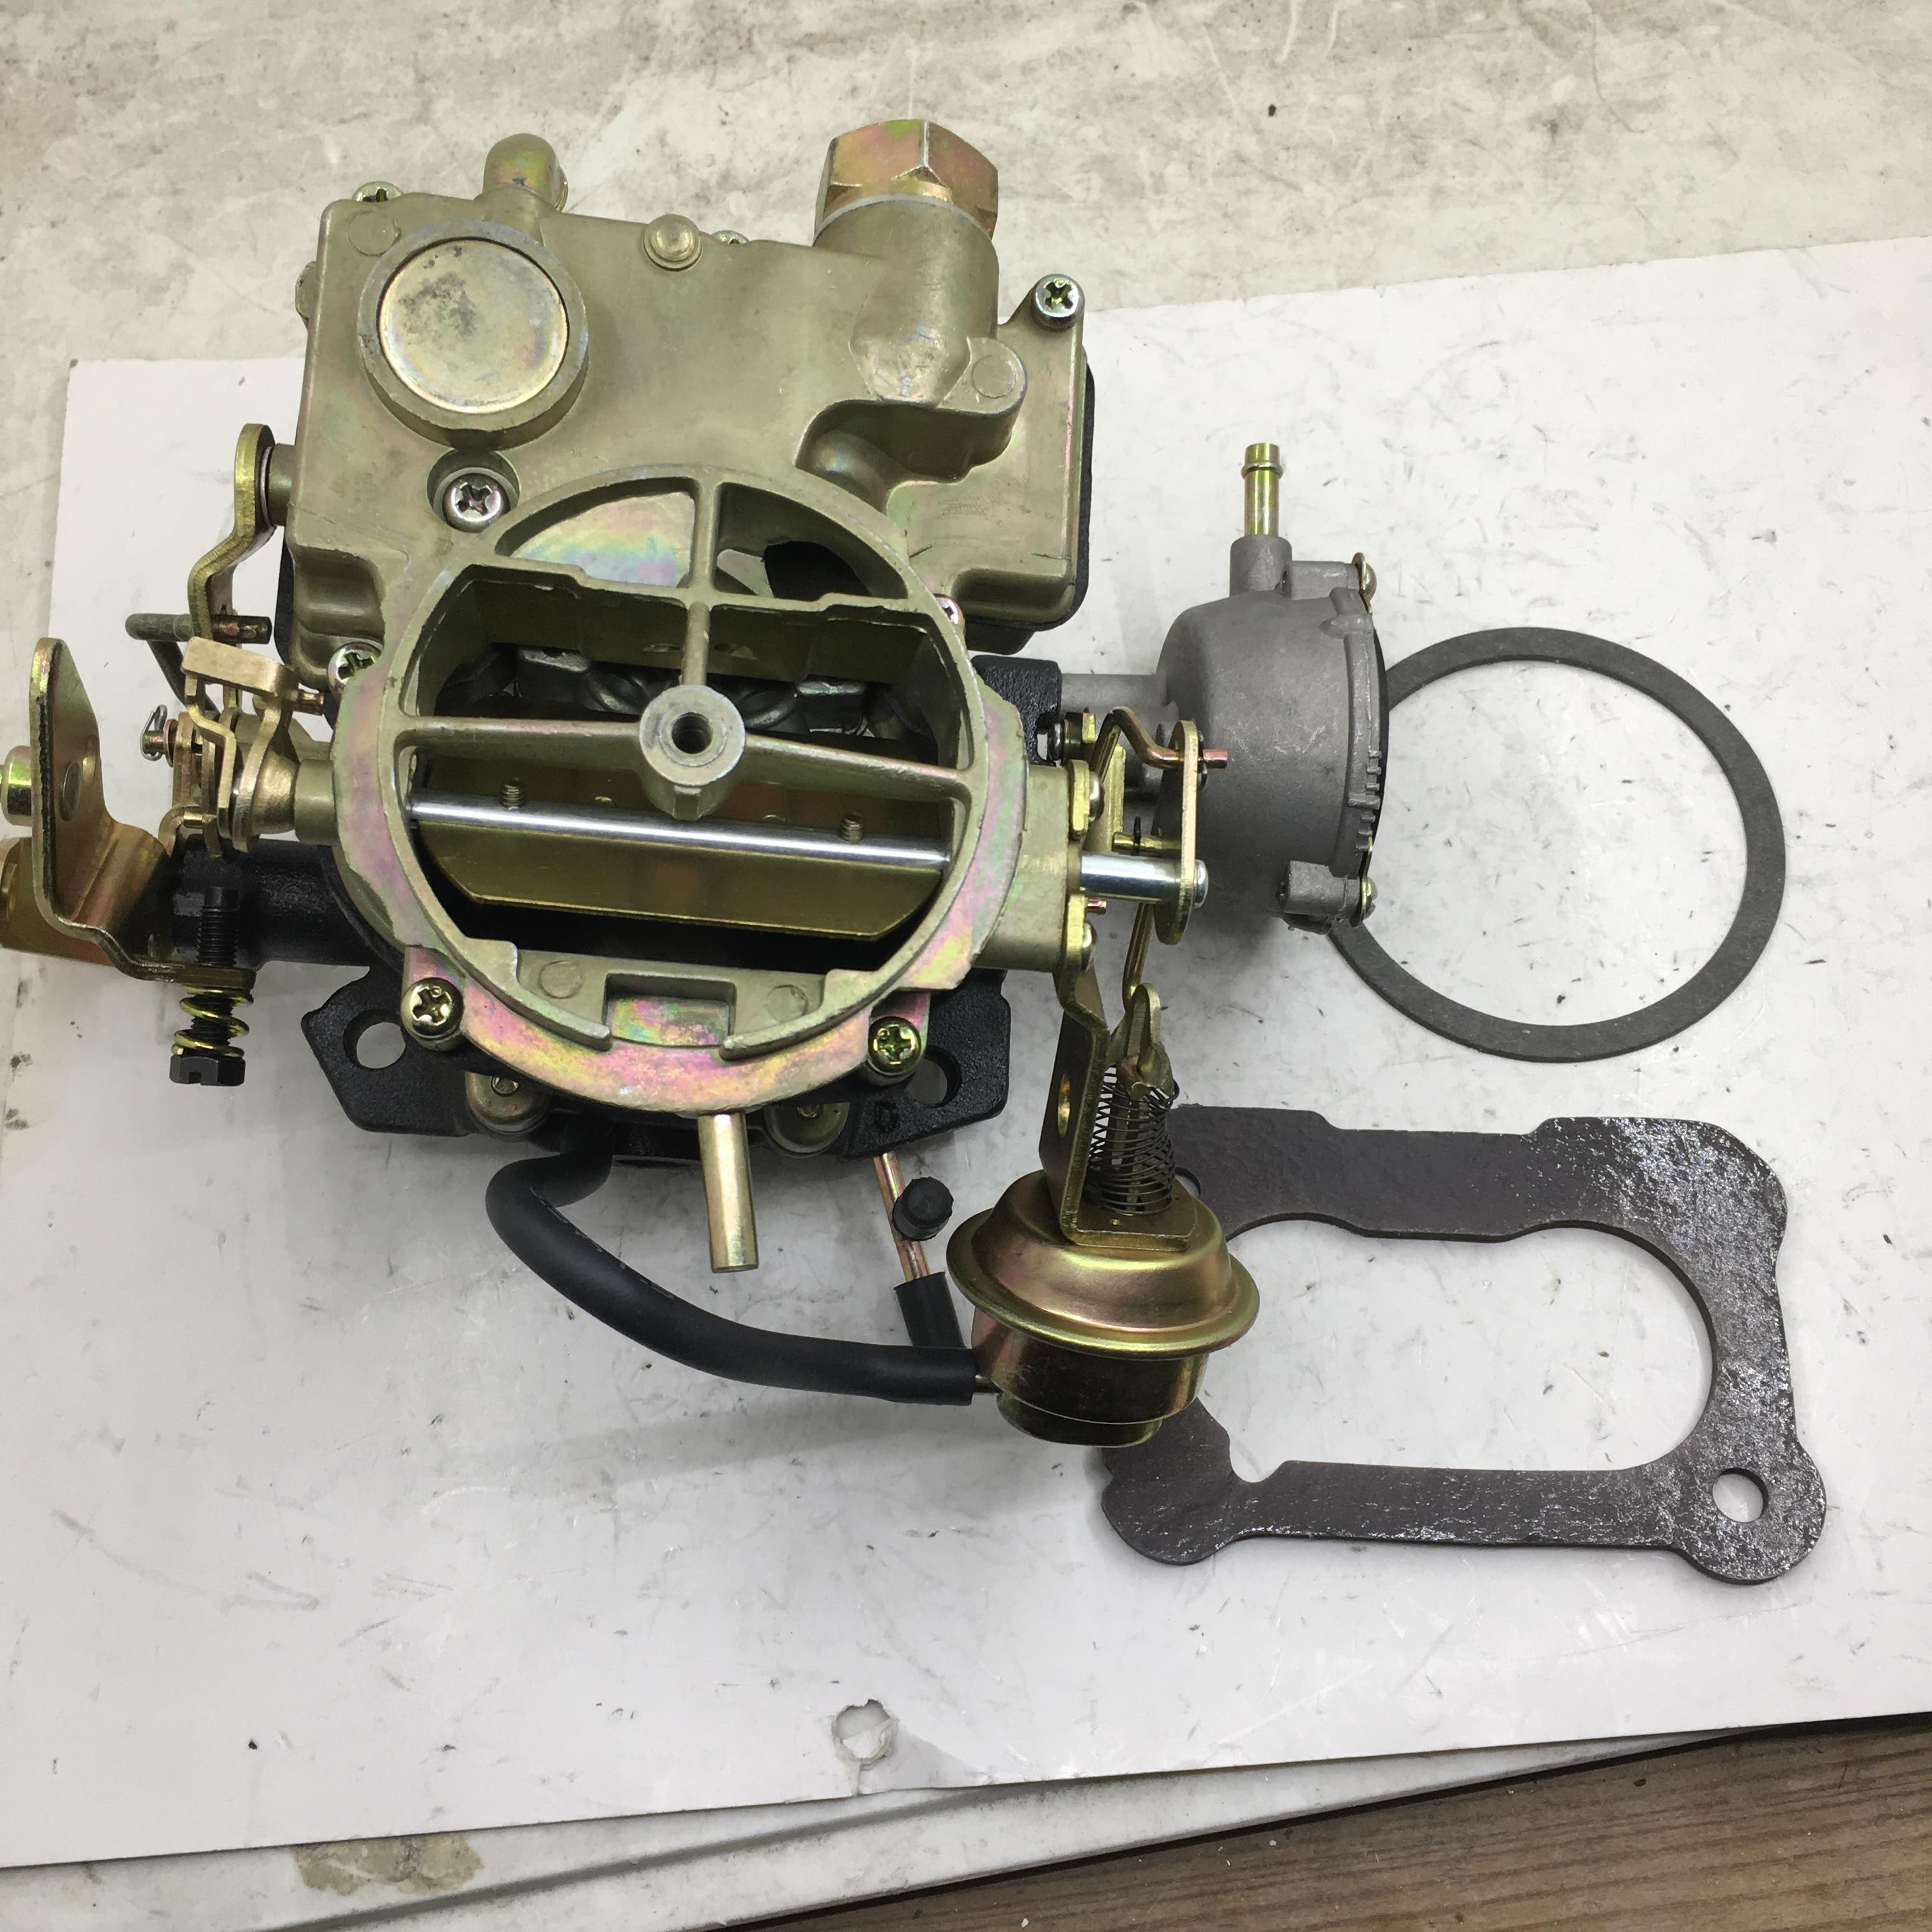 شاربيرغ carb carburettor carburador للمكربن البحري 4 اسطوانة 2 برميل روتشستر MERCARB استبدال 3.0L 807504